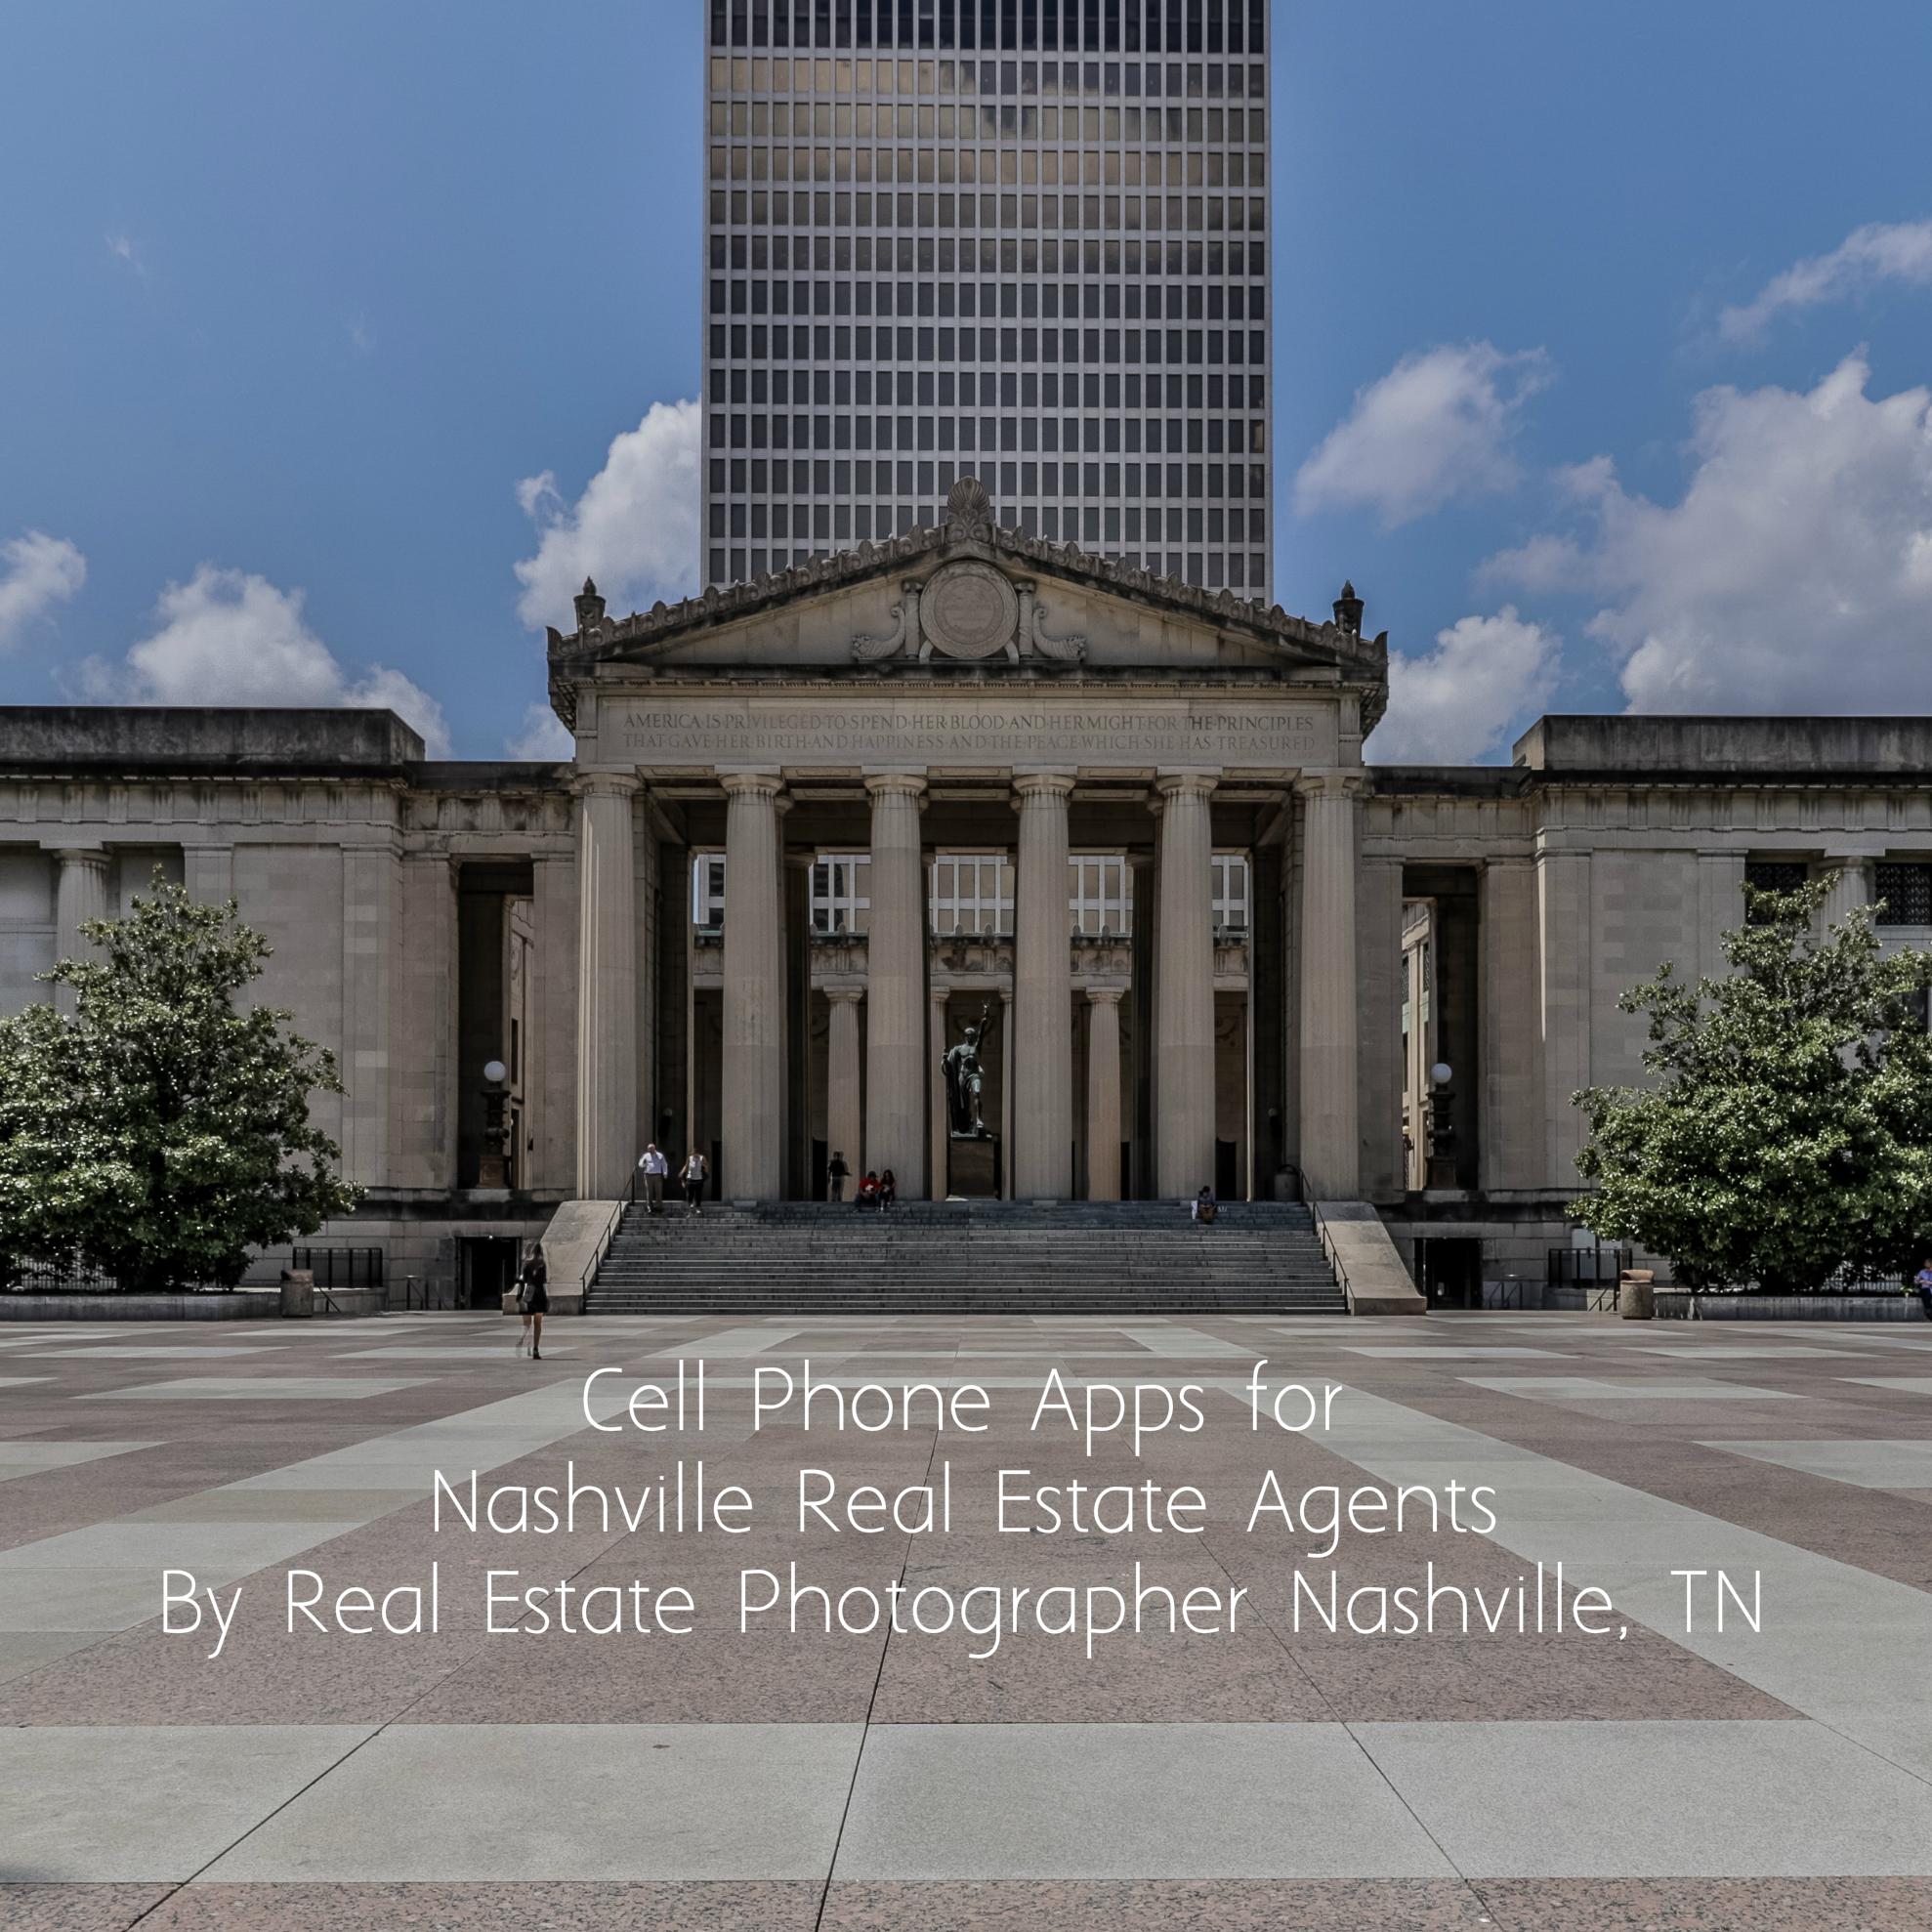 Cell Phone Apps for Nashville Real Estate Agents By Real Estate Photographer Nashville, TN